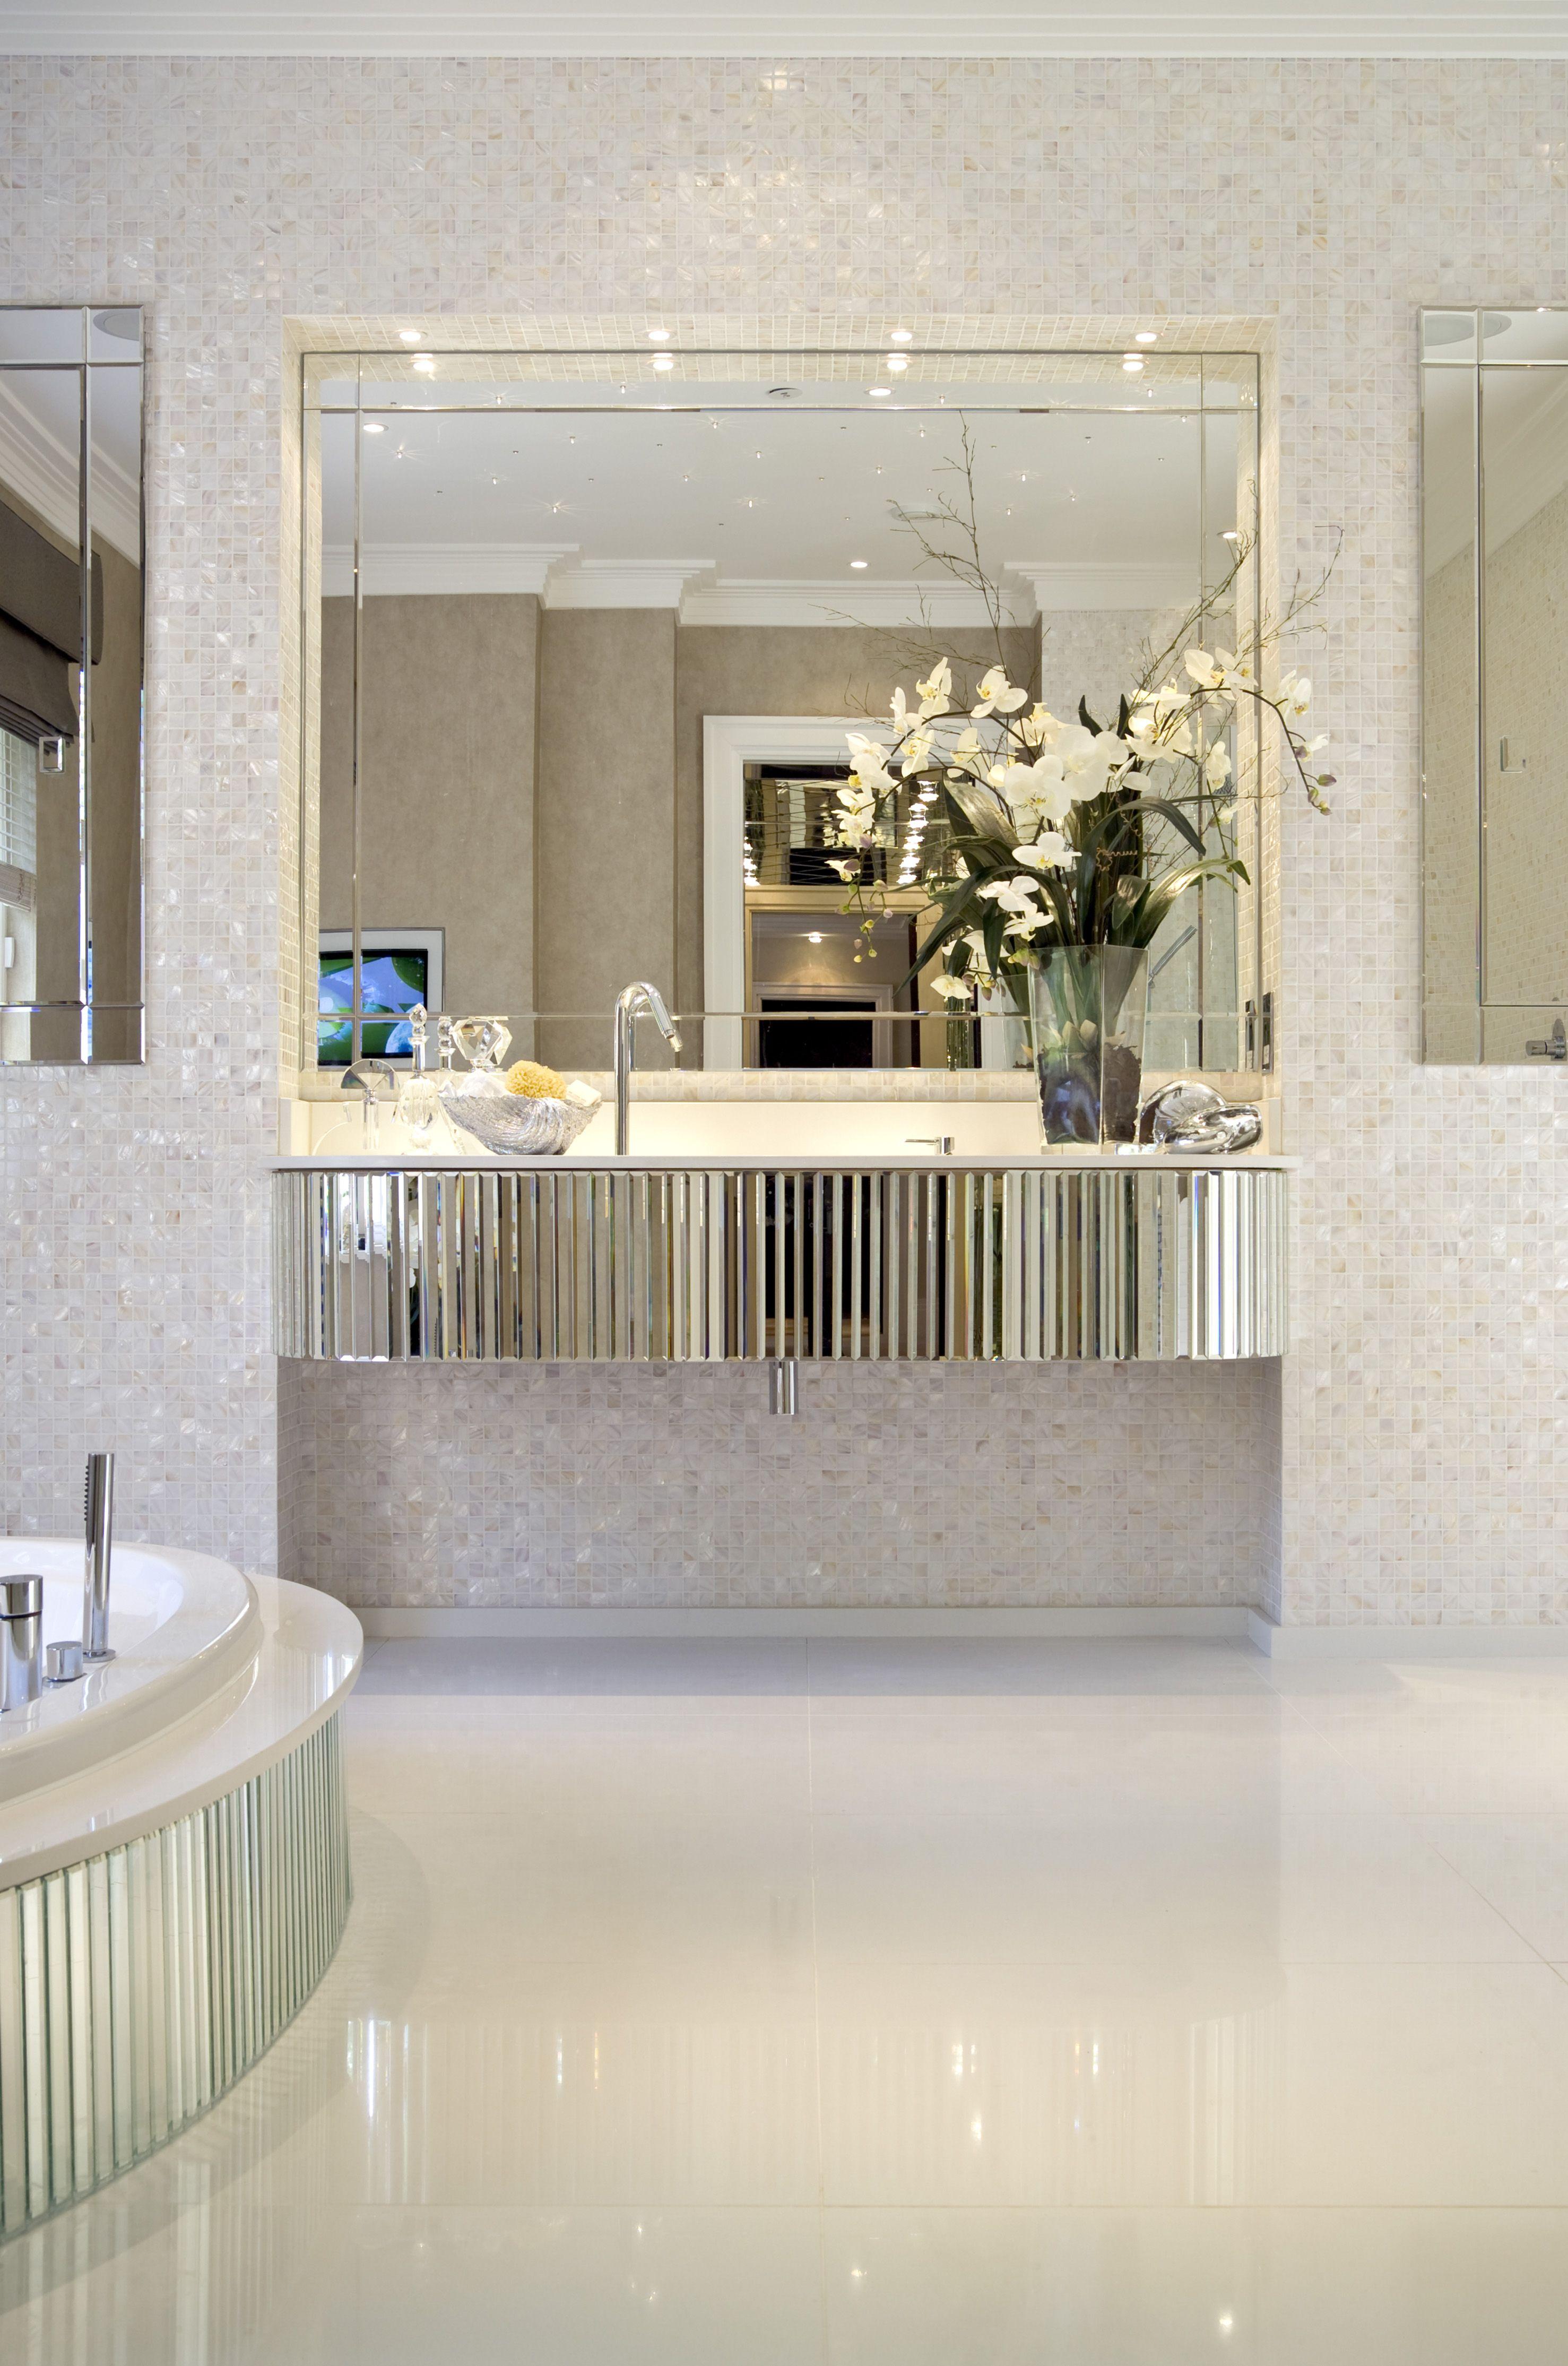 Pin By Ana Lucia Moya On Hill House Details Glamorous Bathroom Bathroom Styling Bathroom Decor Colors